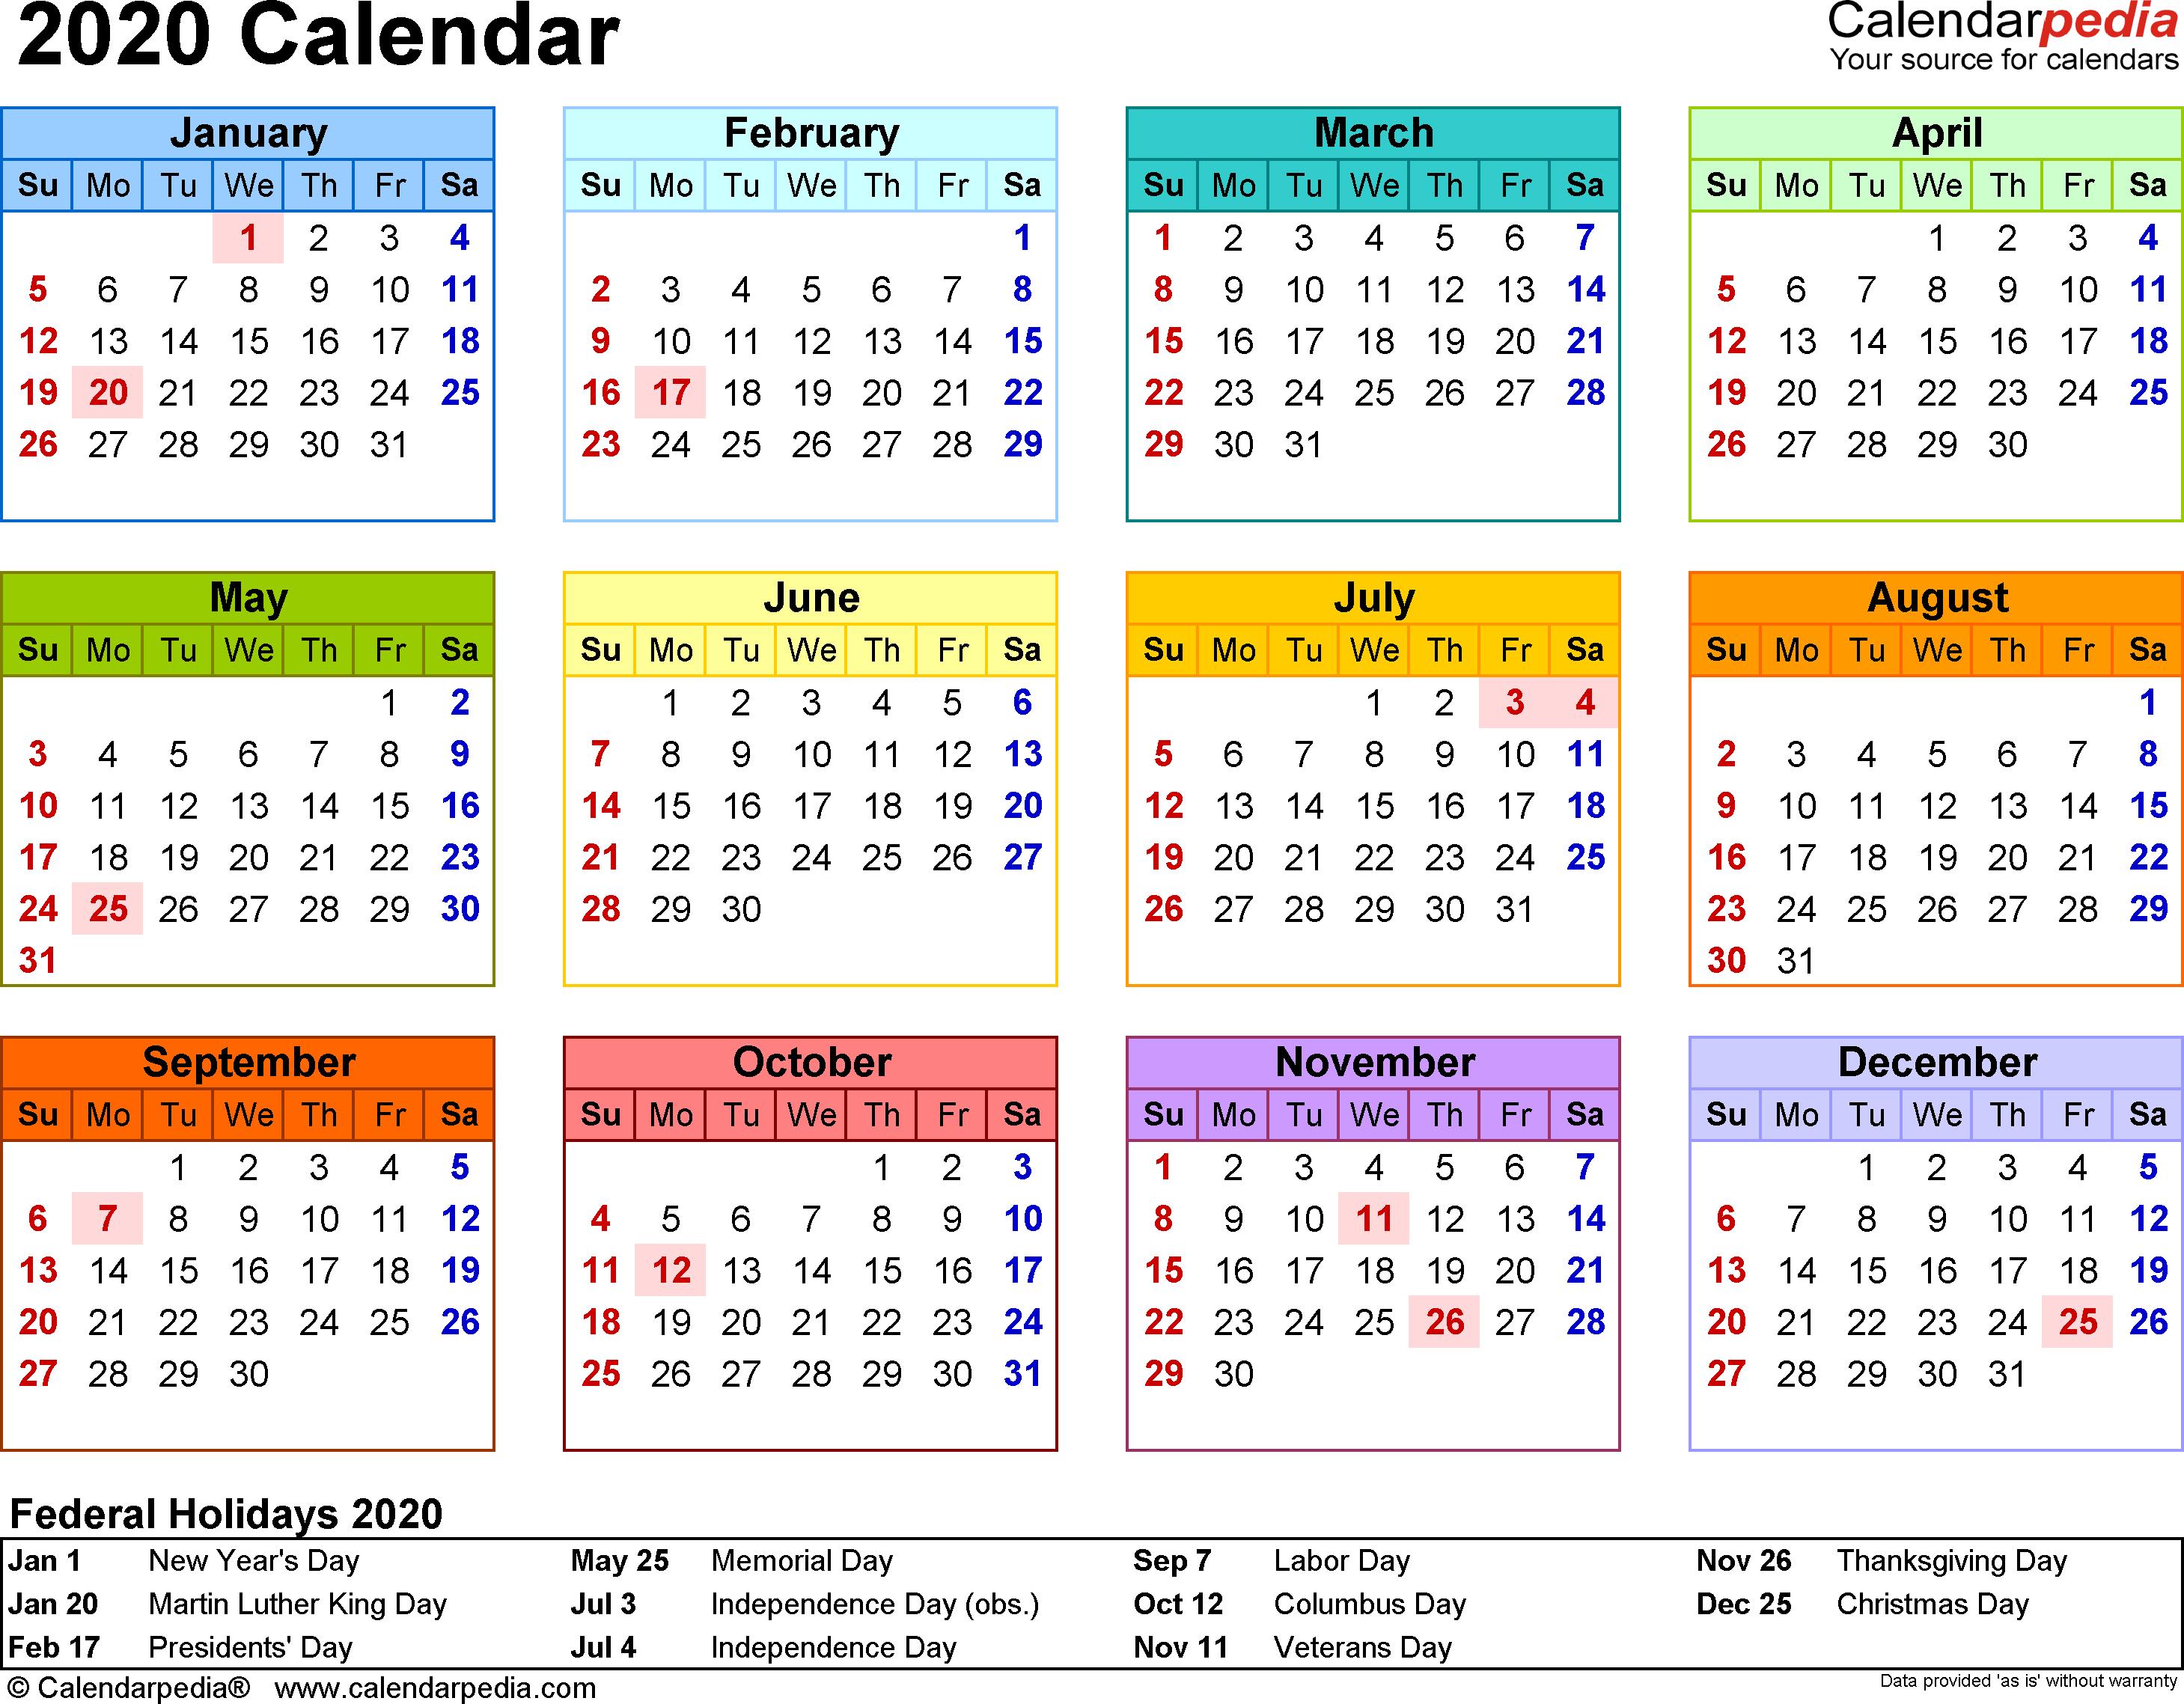 2020 Calendar - 17 Free Printable Word Calendar Templates intended for 2020 Calendar Printable One Page